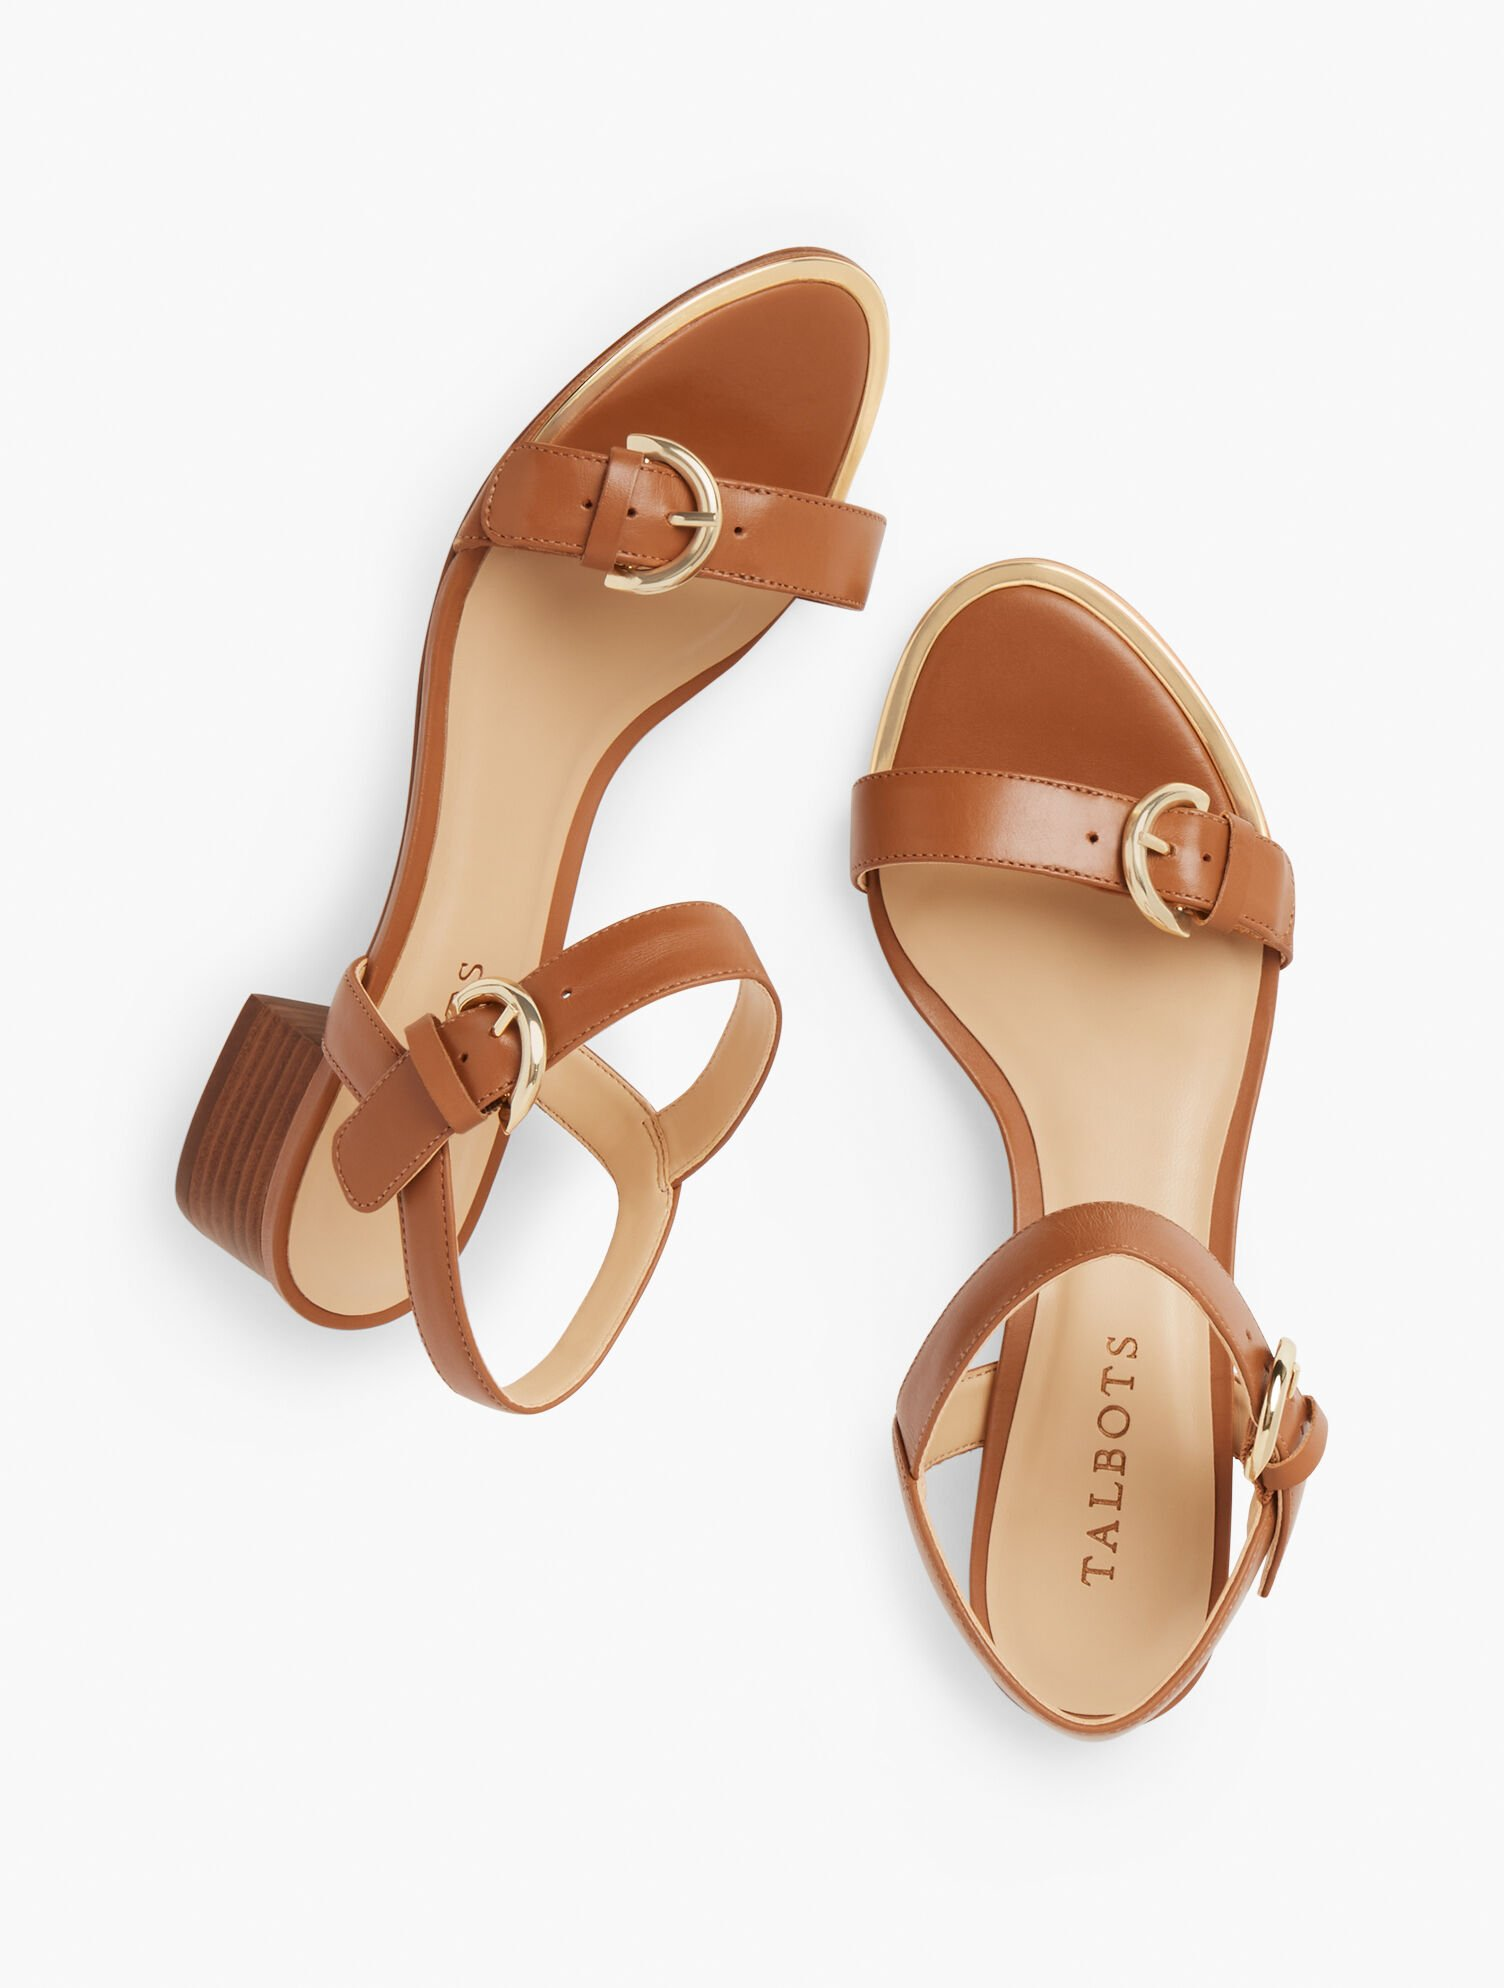 Talbots Fiji Soft Vachetta Sandals for weekly finds